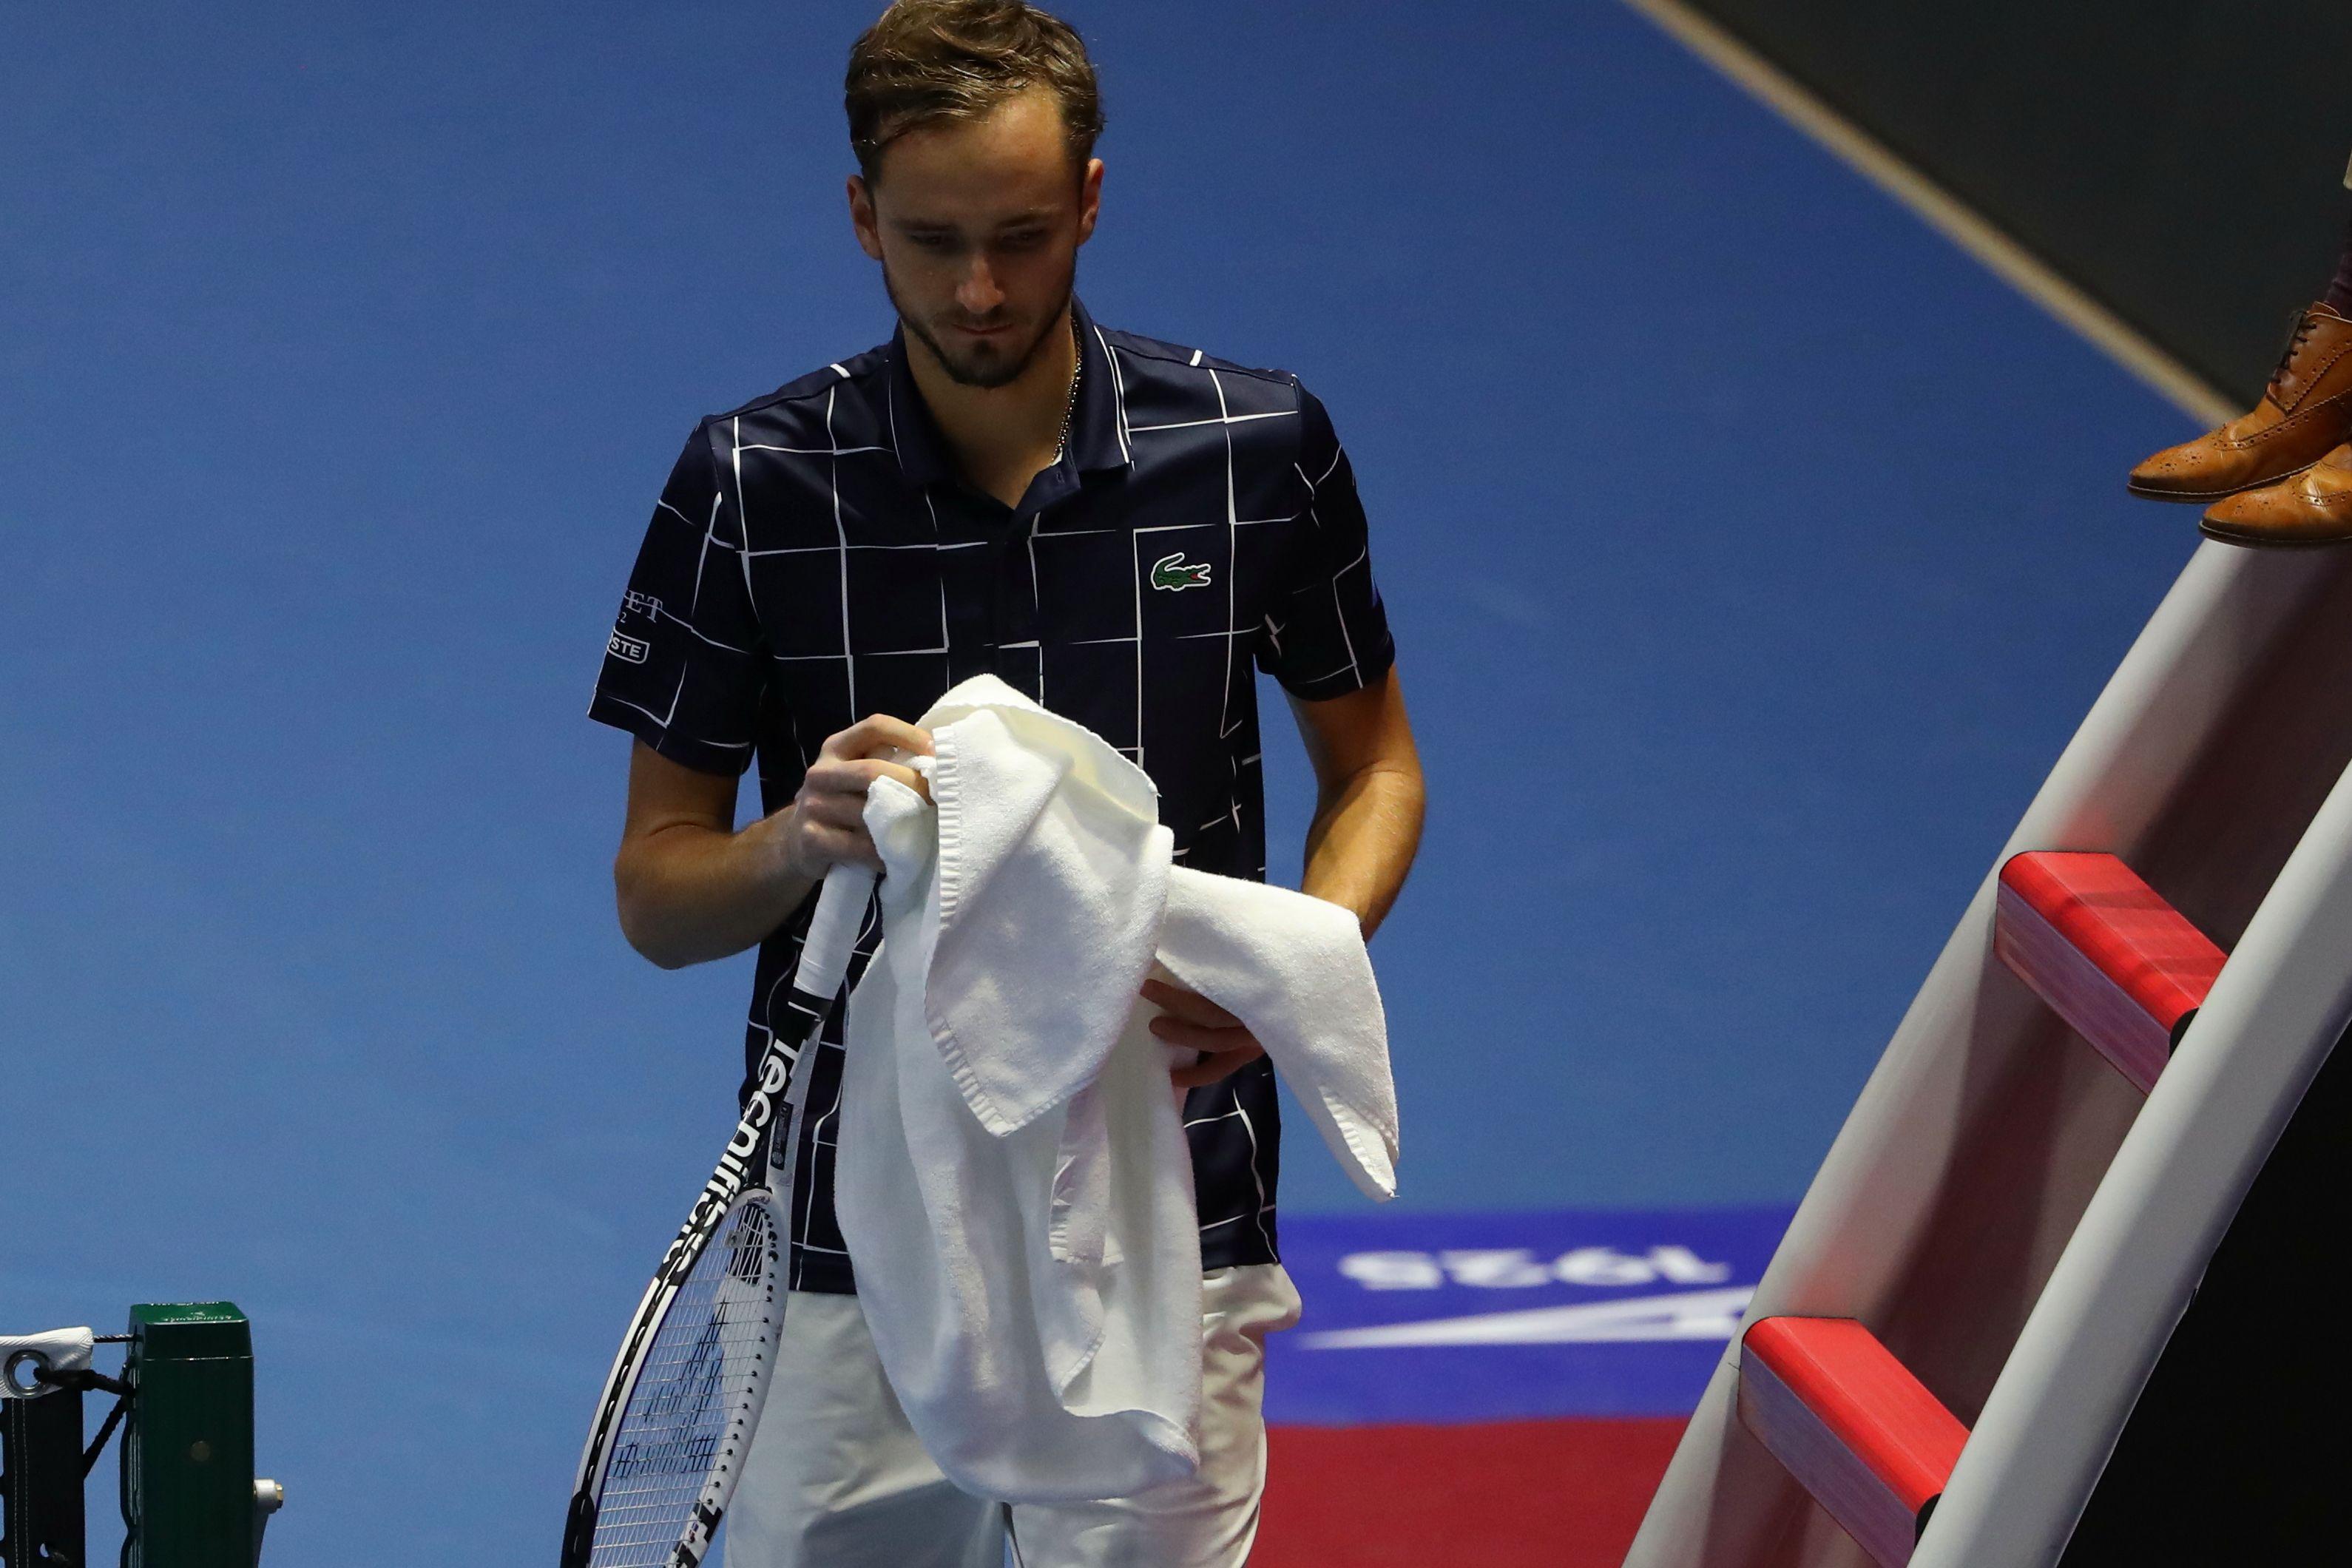 Теннис, АТР, Париж, полуфинал, Медведев - Раонич, прямая текстовая онлайн трансляция